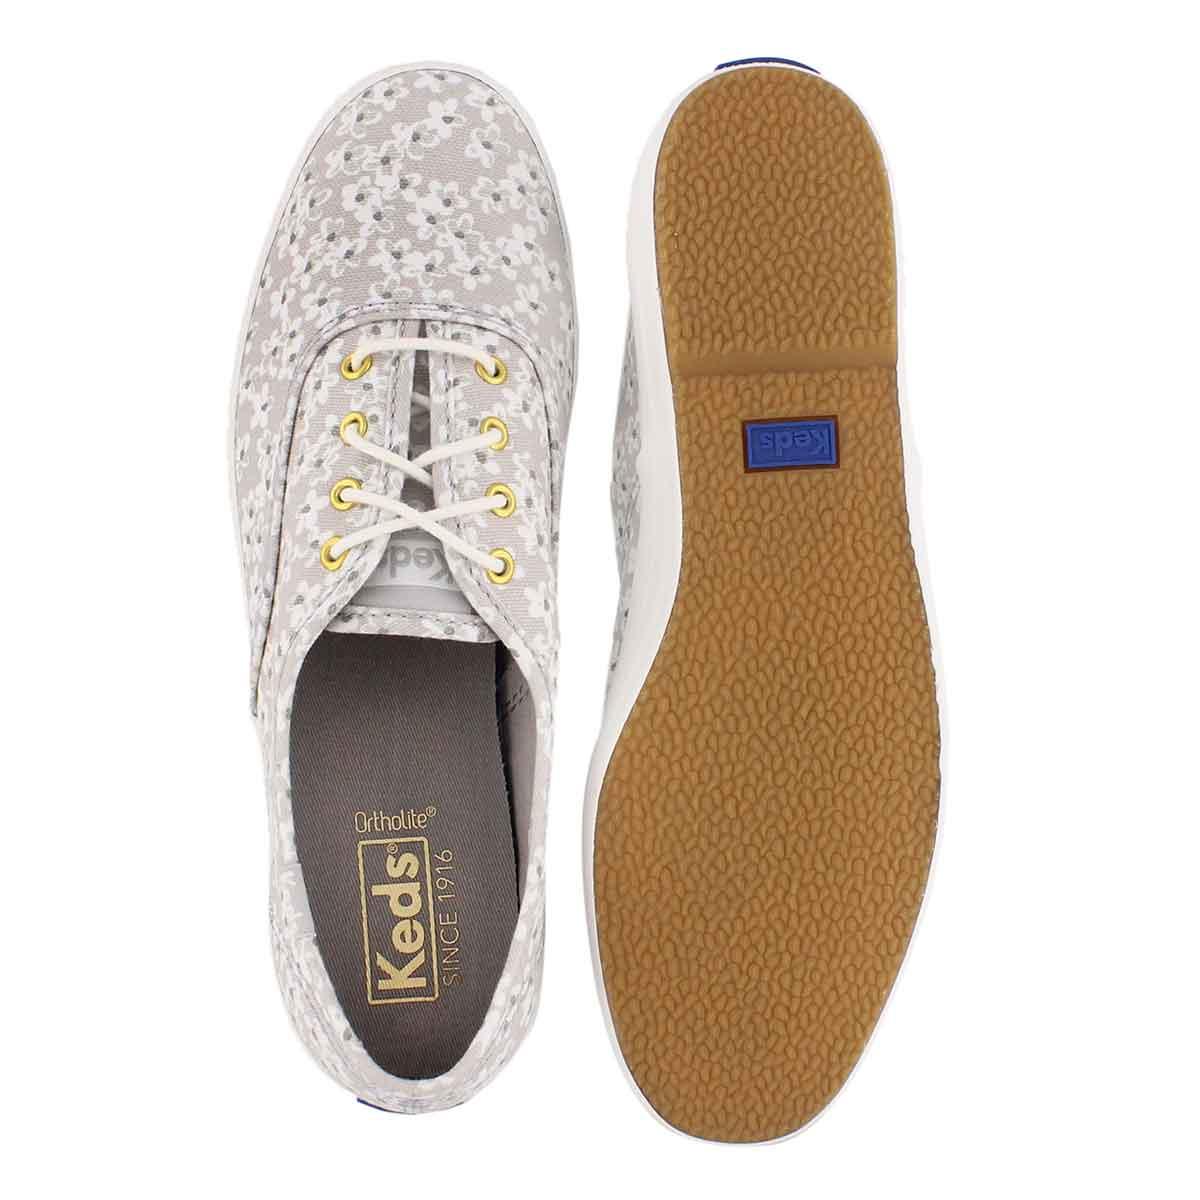 Lds Champion Floral lt grey sneaker